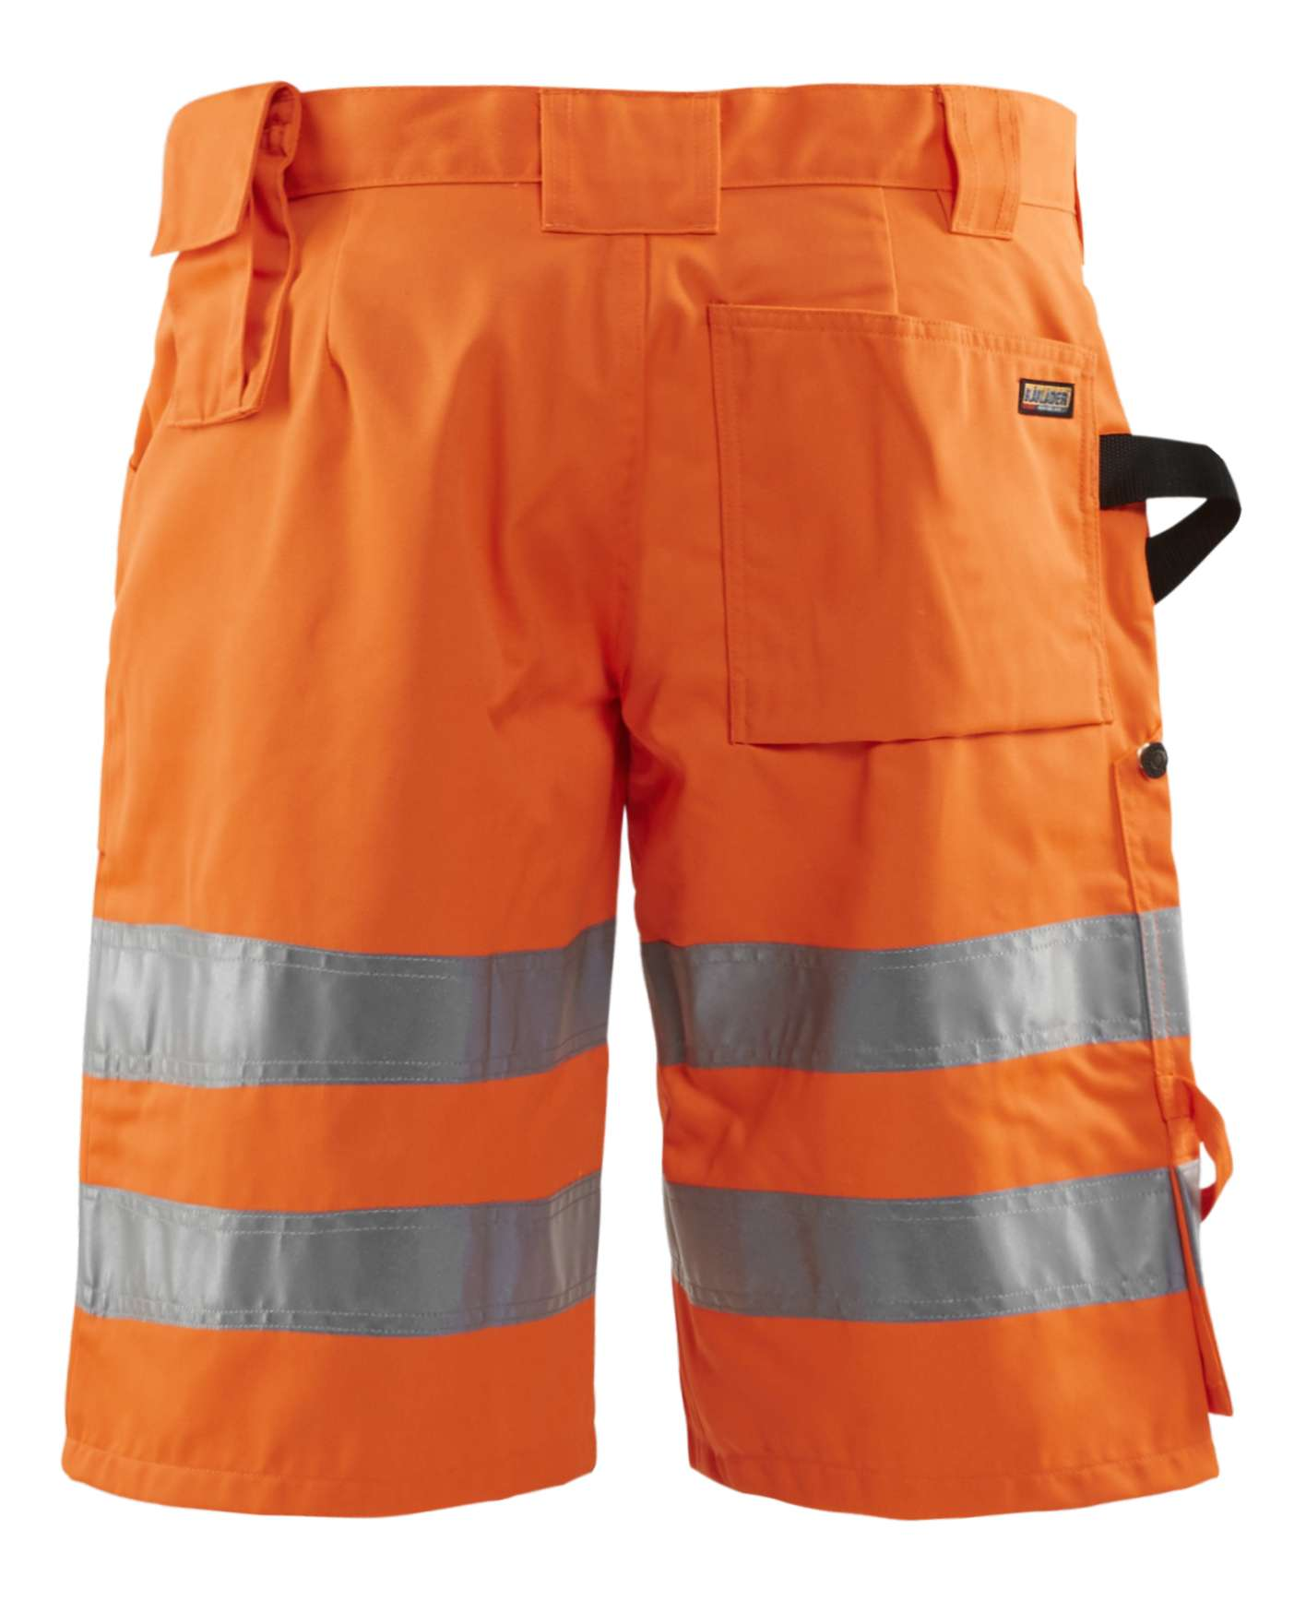 Blaklader Korte werkbroeken 15371804 High Vis oranje(5300)